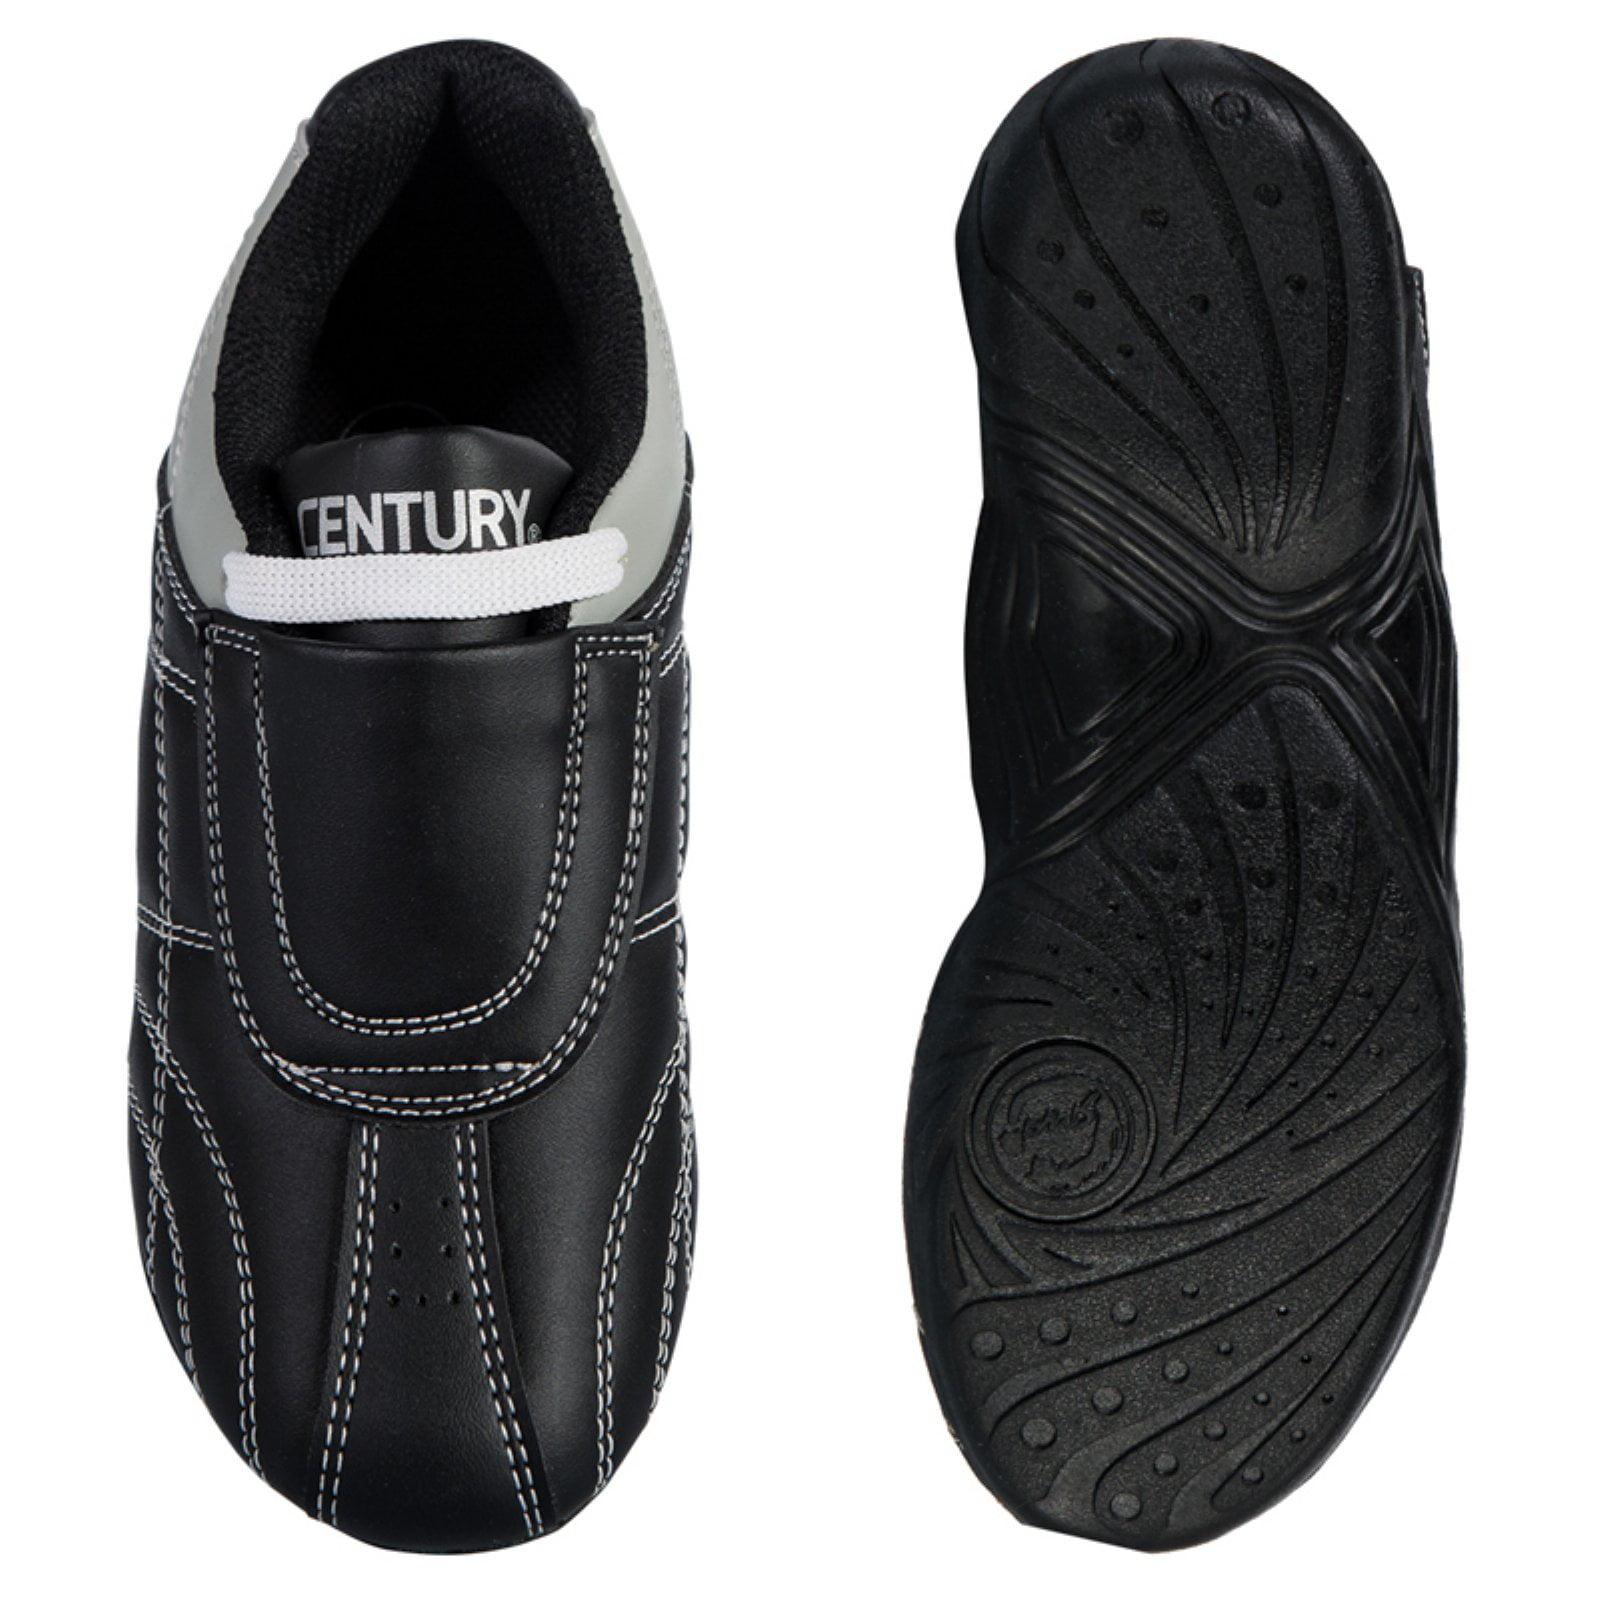 Century® Lightfoot Martial Arts Shoe - Black SZ 12